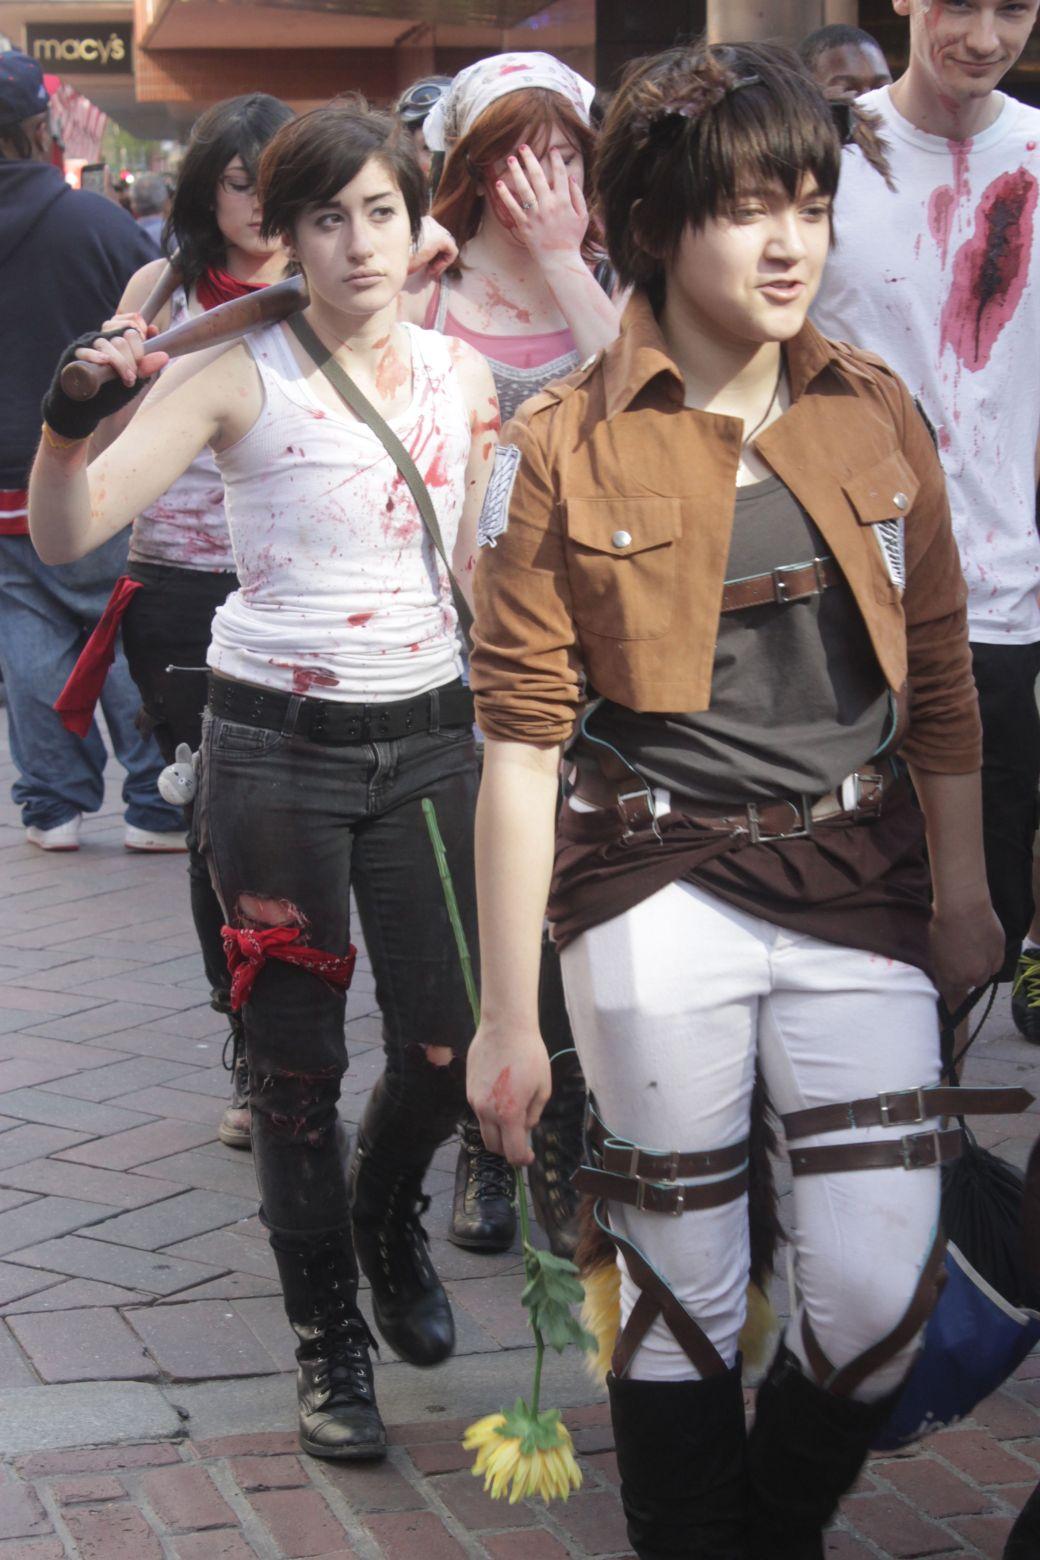 boston zombie walk may 17 19